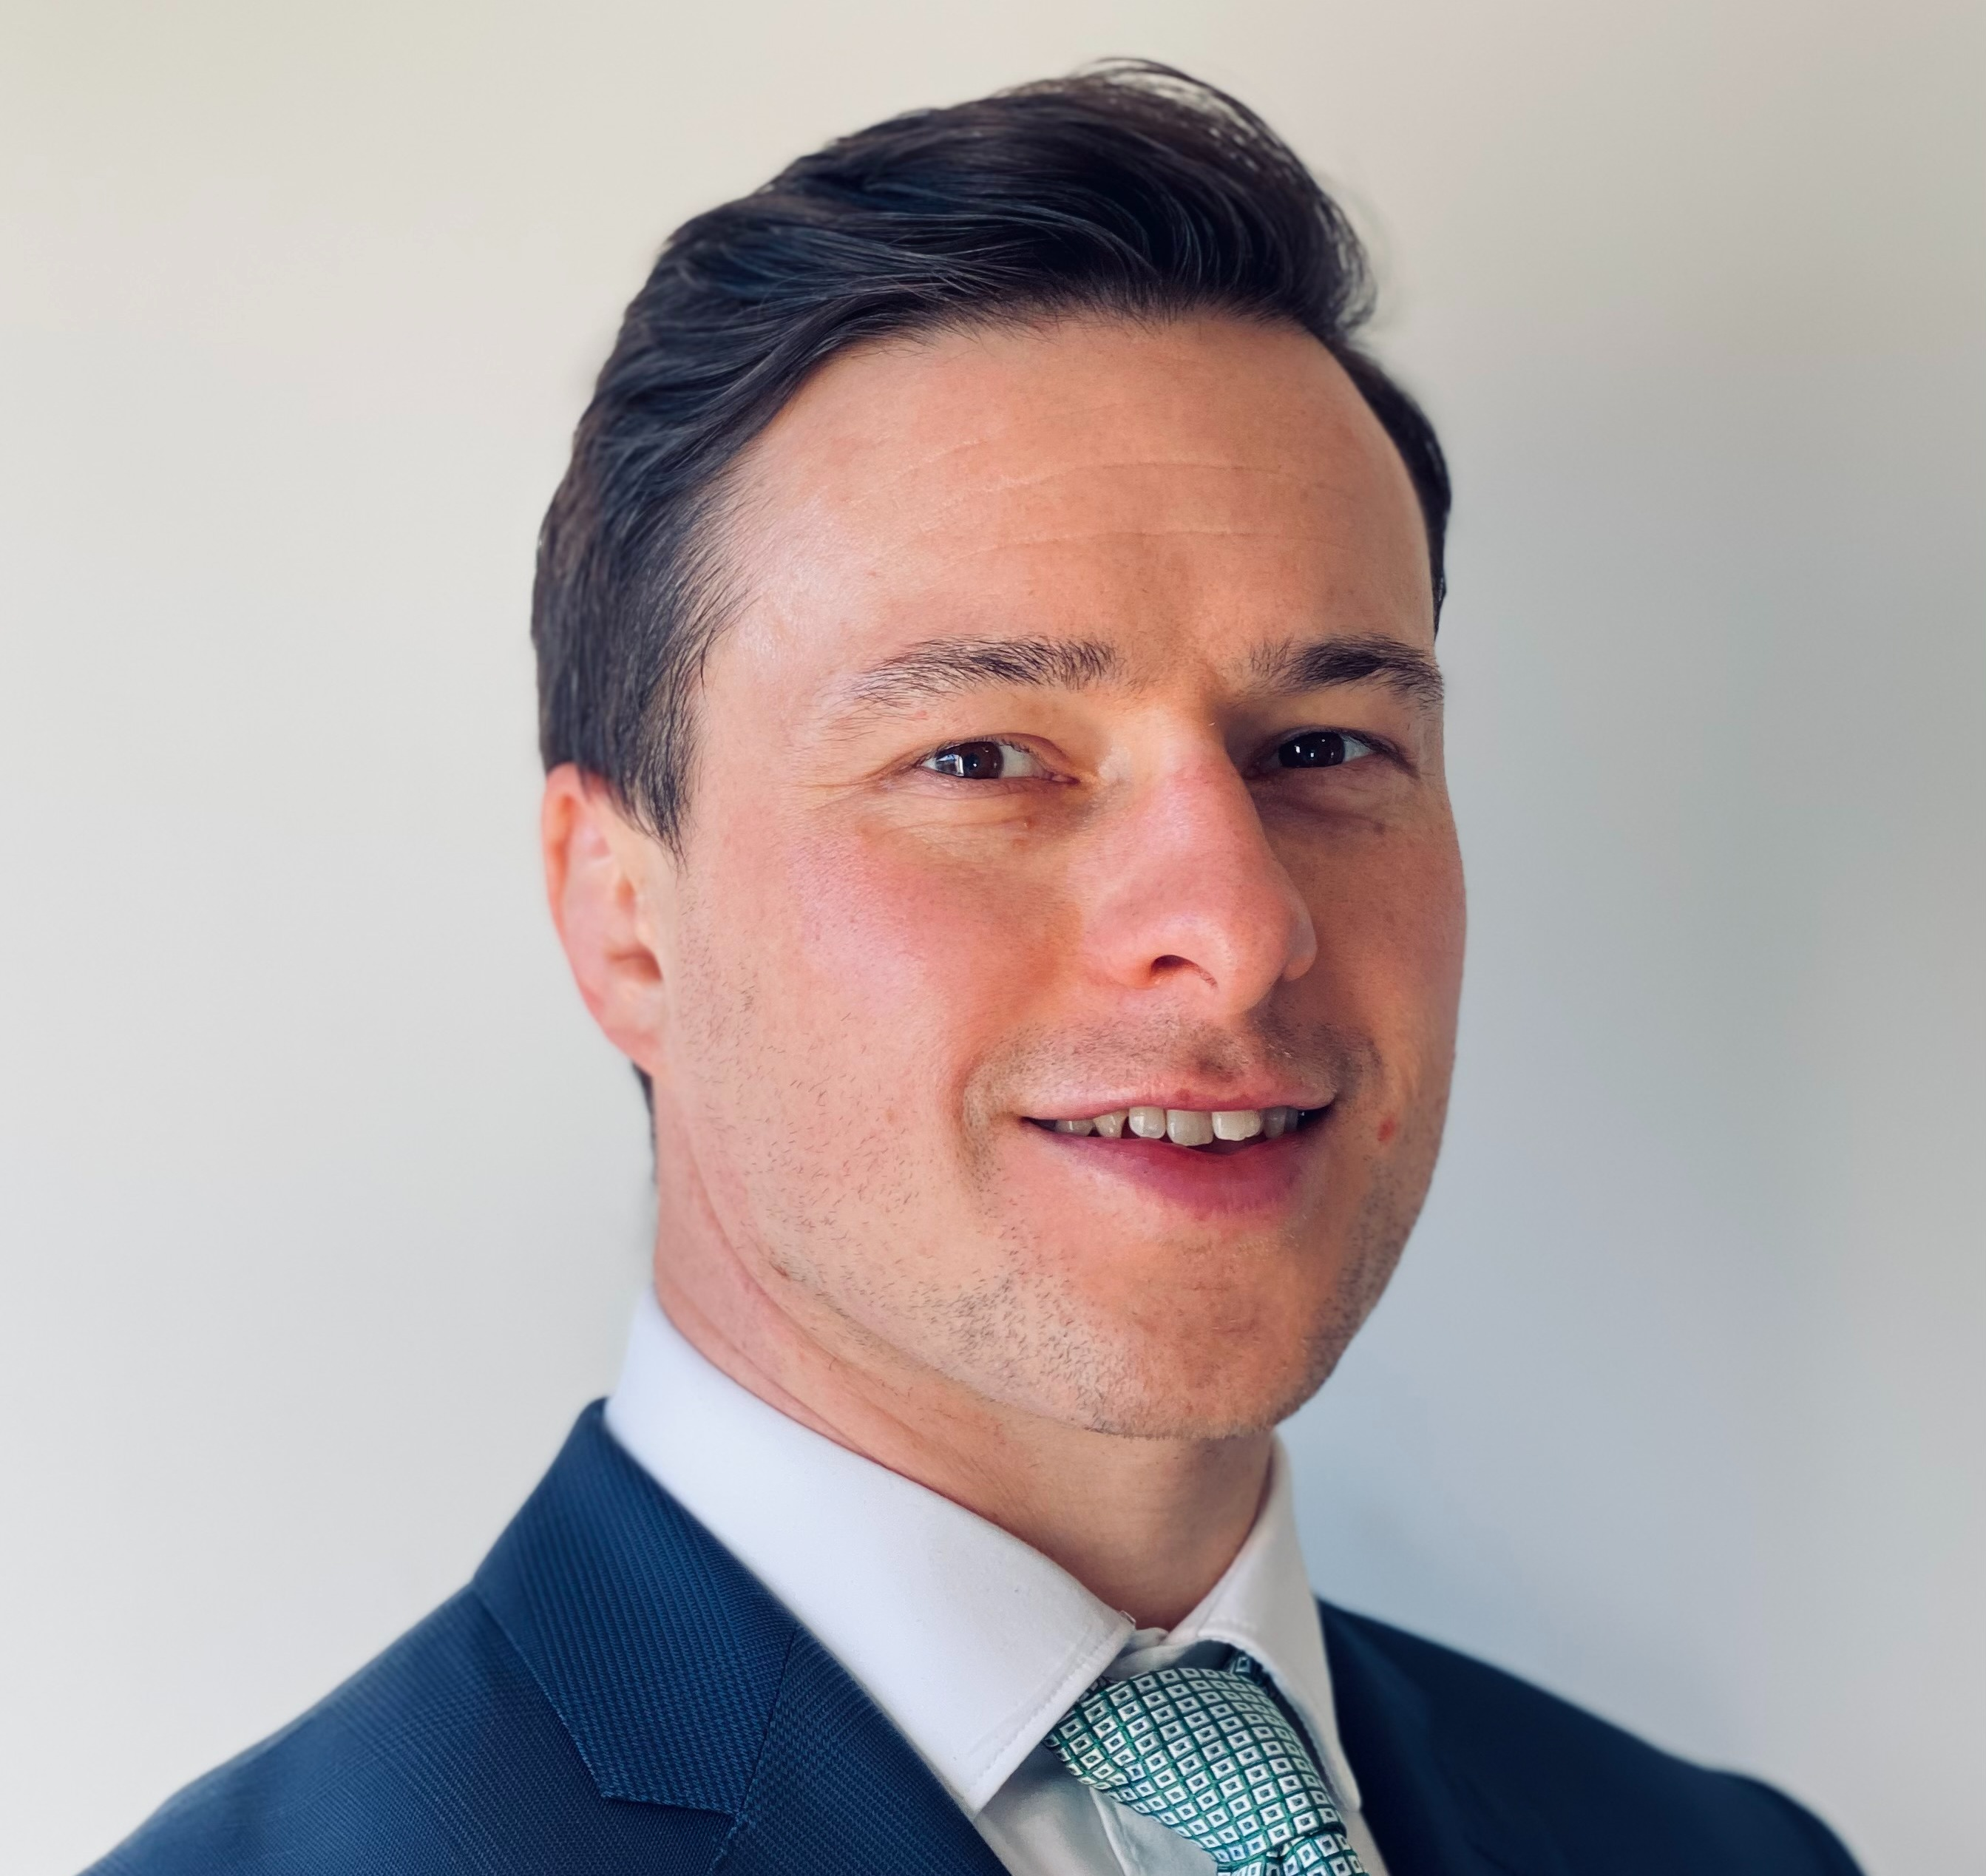 Jonathan Larbey Linkedin Profile Pic